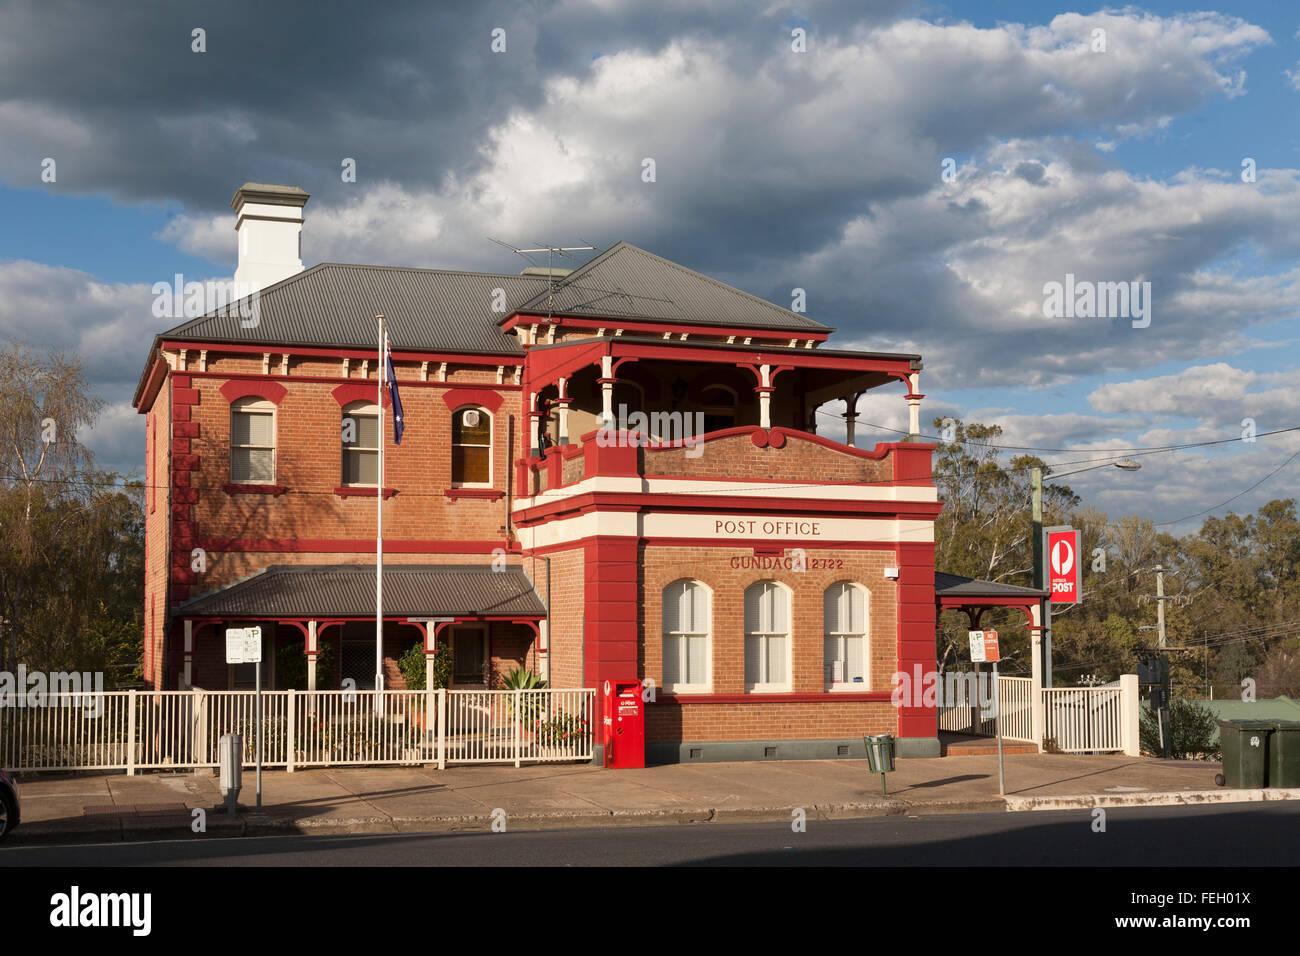 Gundagai New South Wales Stock Photos & Gundagai New South Wales